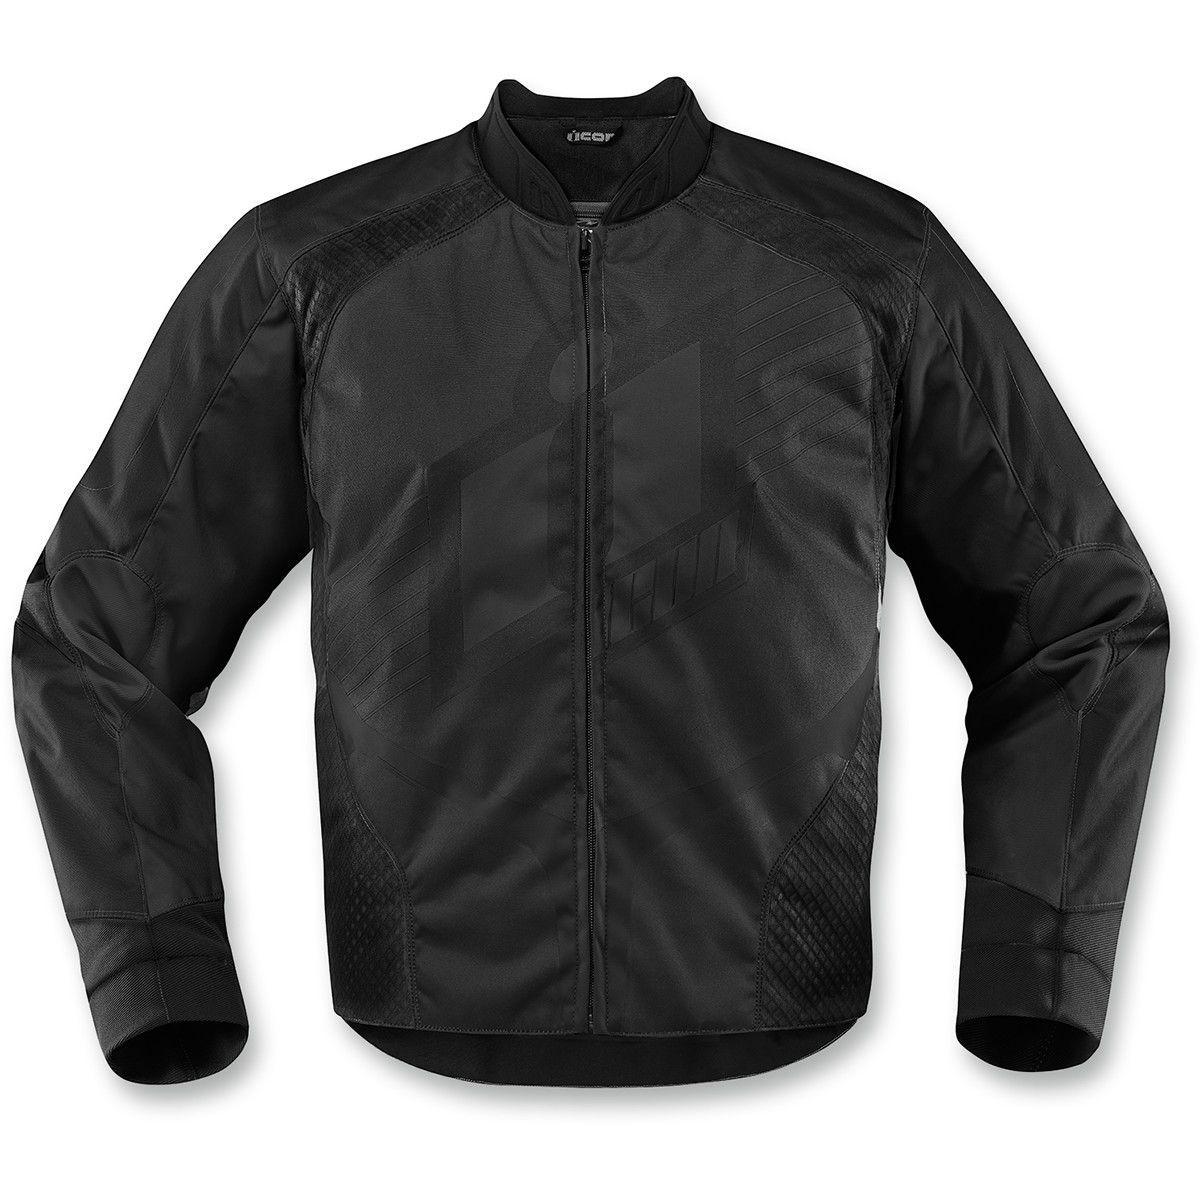 ICON MEN'S OVERLORD™ 2 JACKETS Motorbike jackets